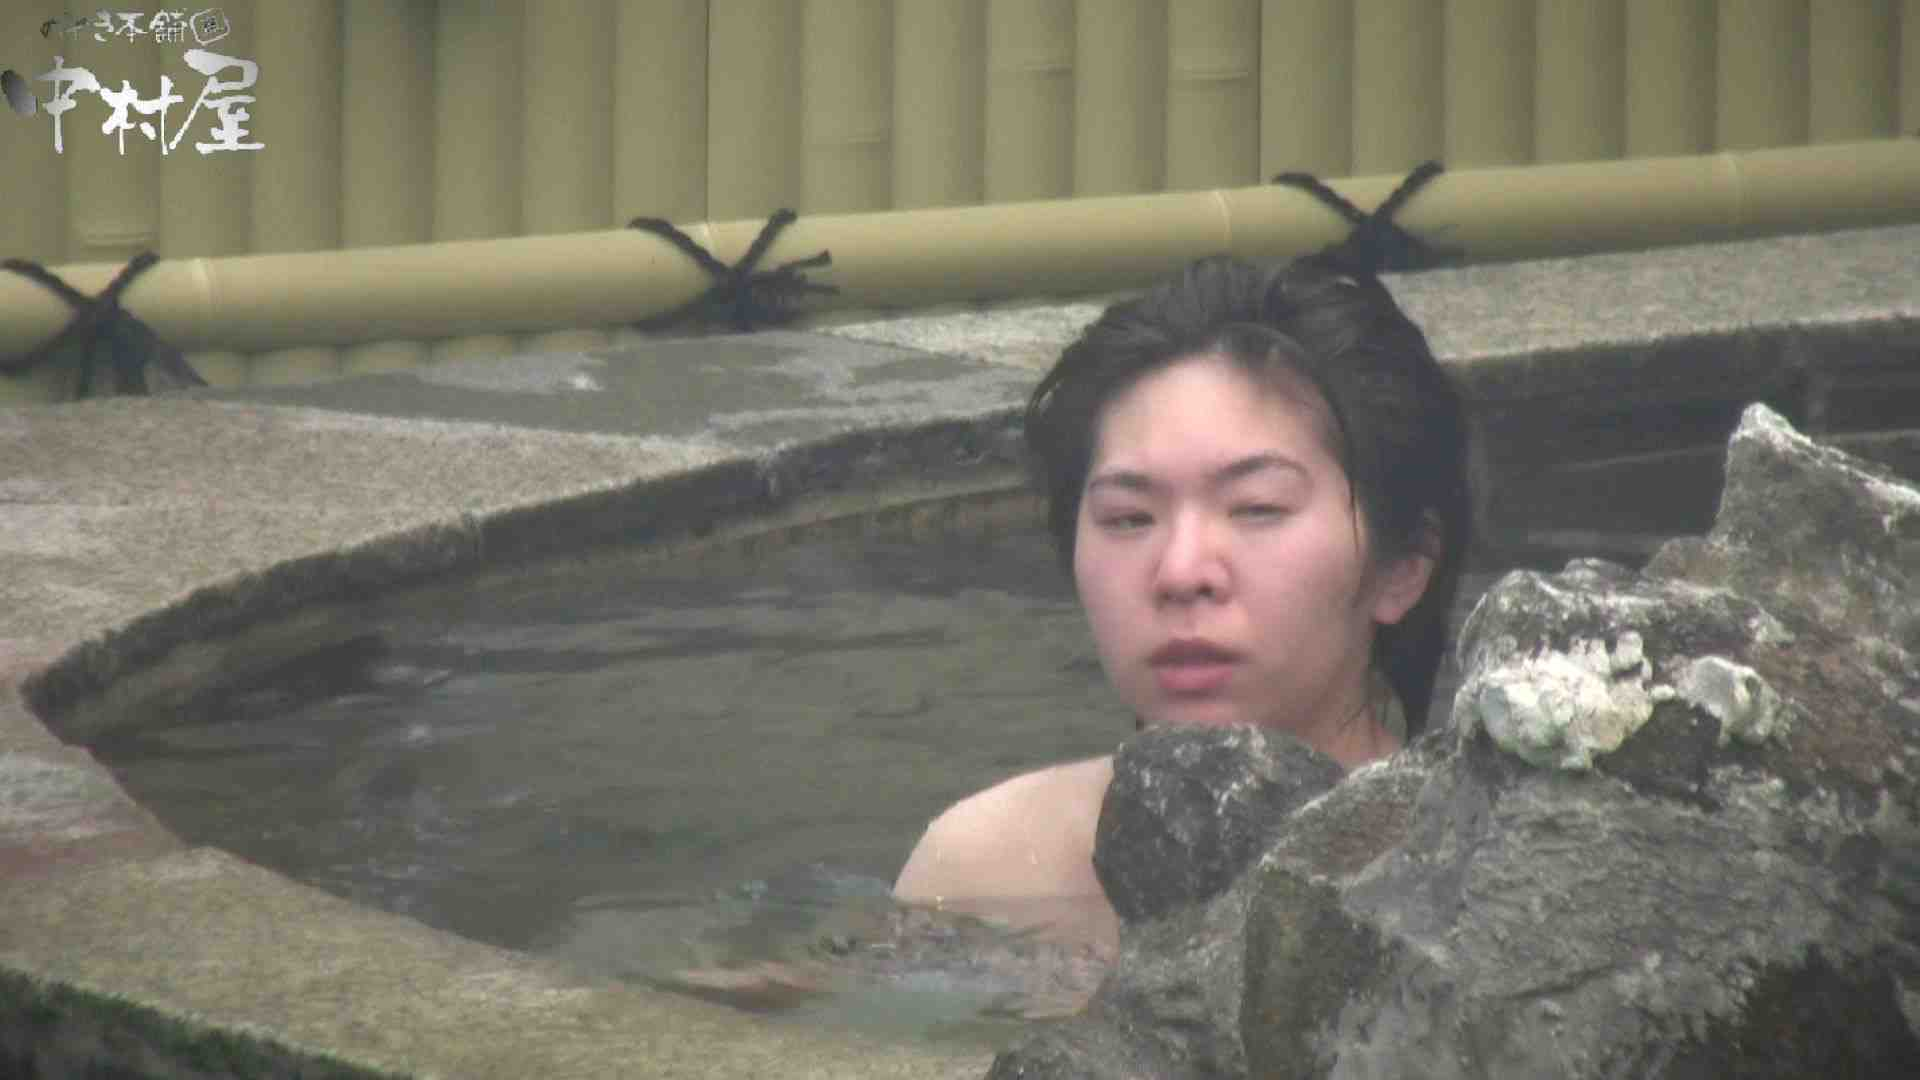 Aquaな露天風呂Vol.907 エロいOL | 0  35枚